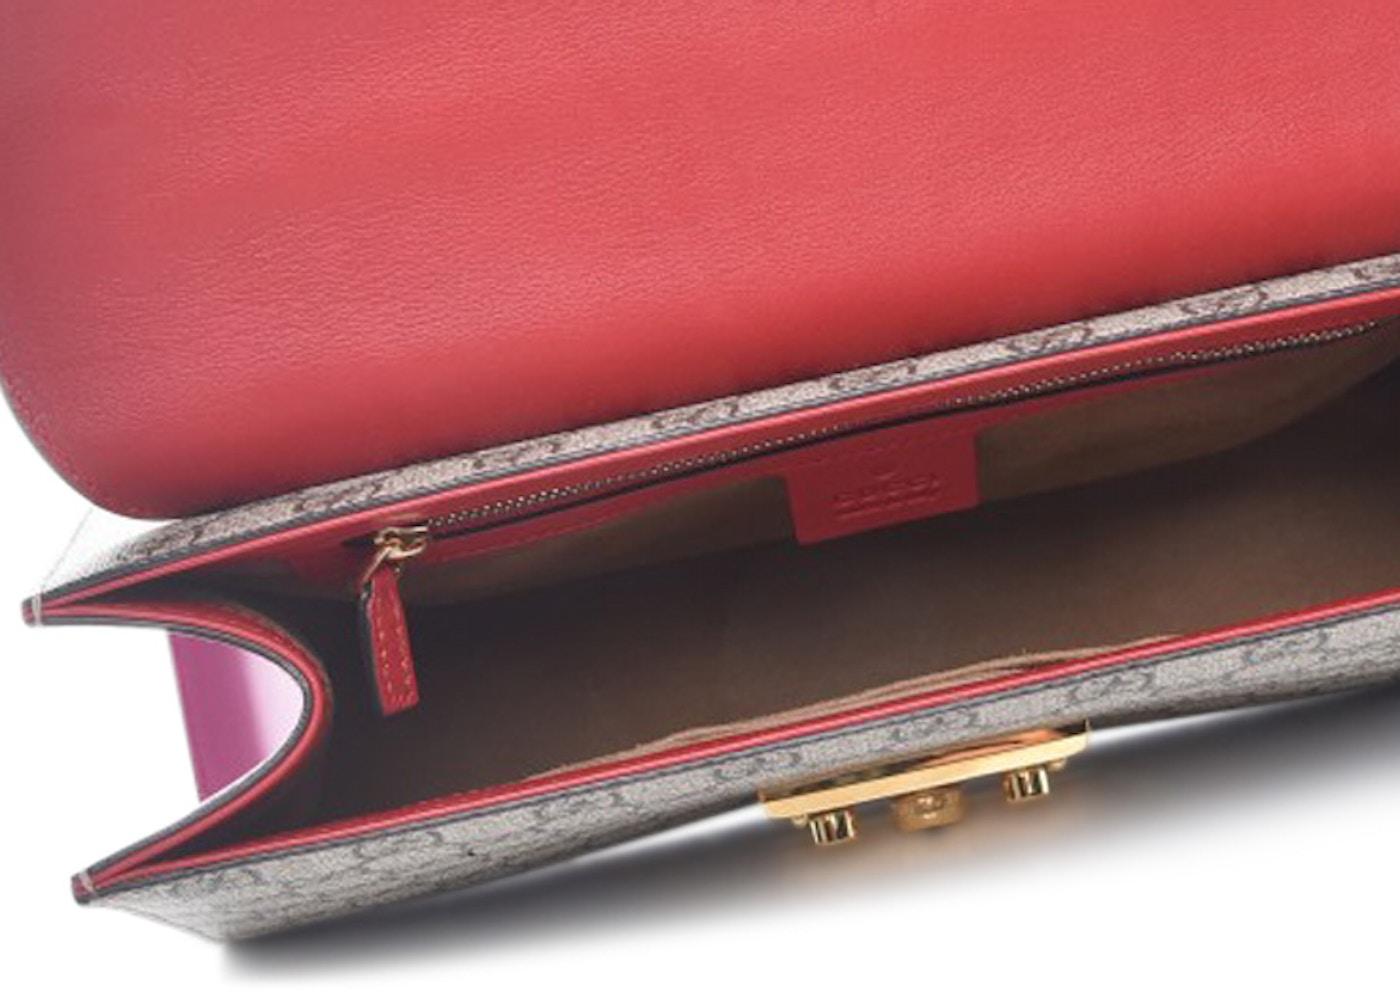 9f6ab5bee02a Gucci Padlock Monogram GG Supreme Multicolor Medium Hibiscus Pink/Red/Brown